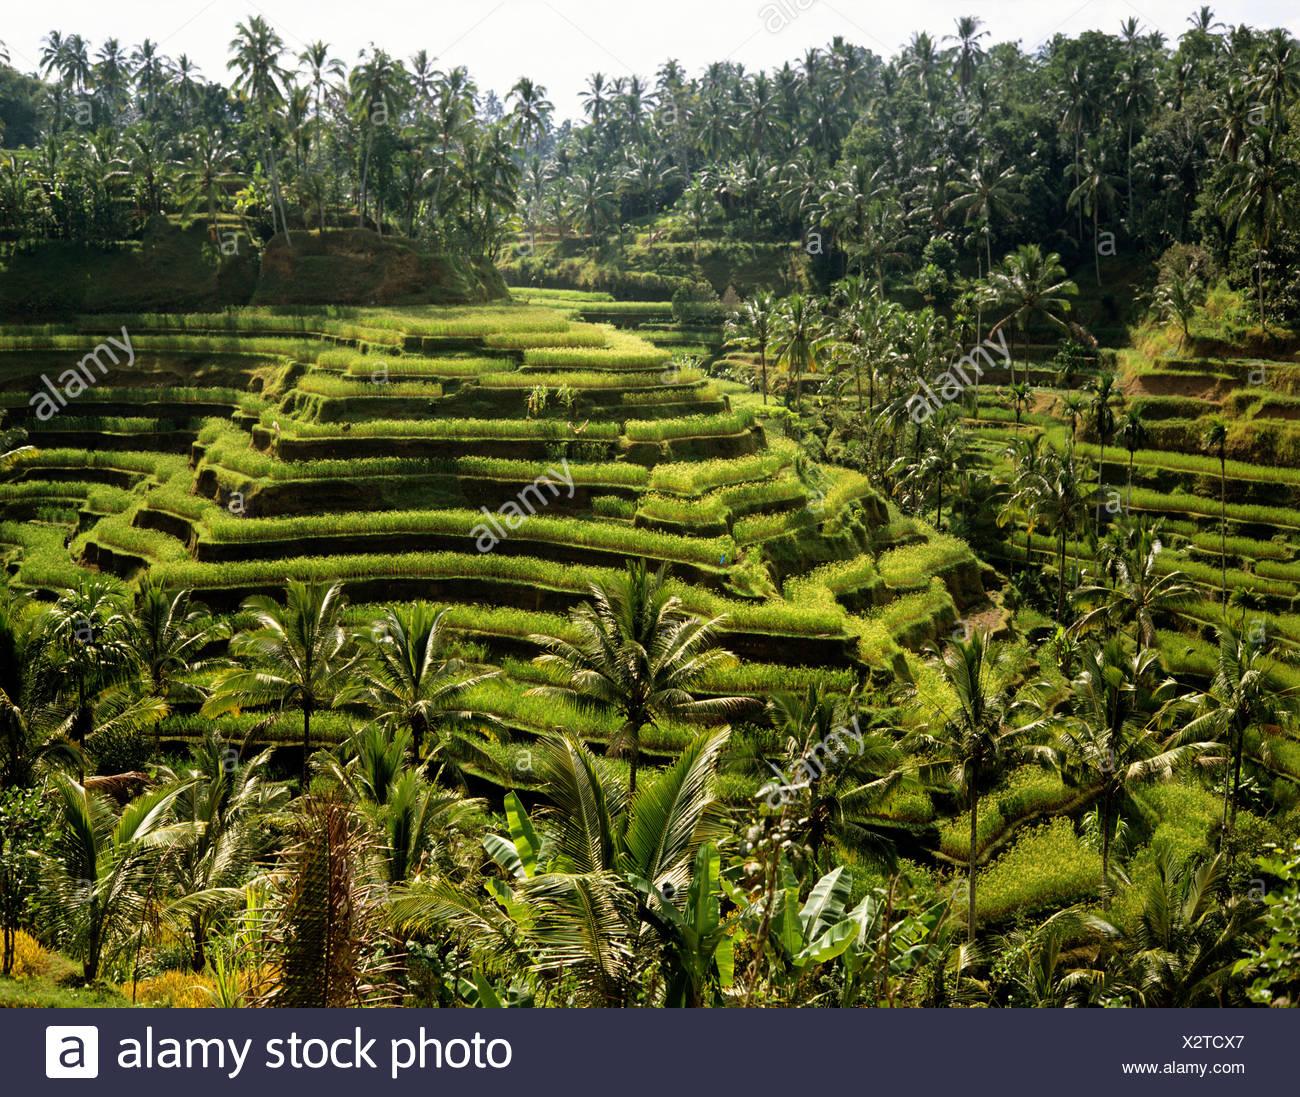 Rice paddies near Ubud, Bali, Indonesia, south-east Asia - Stock Image